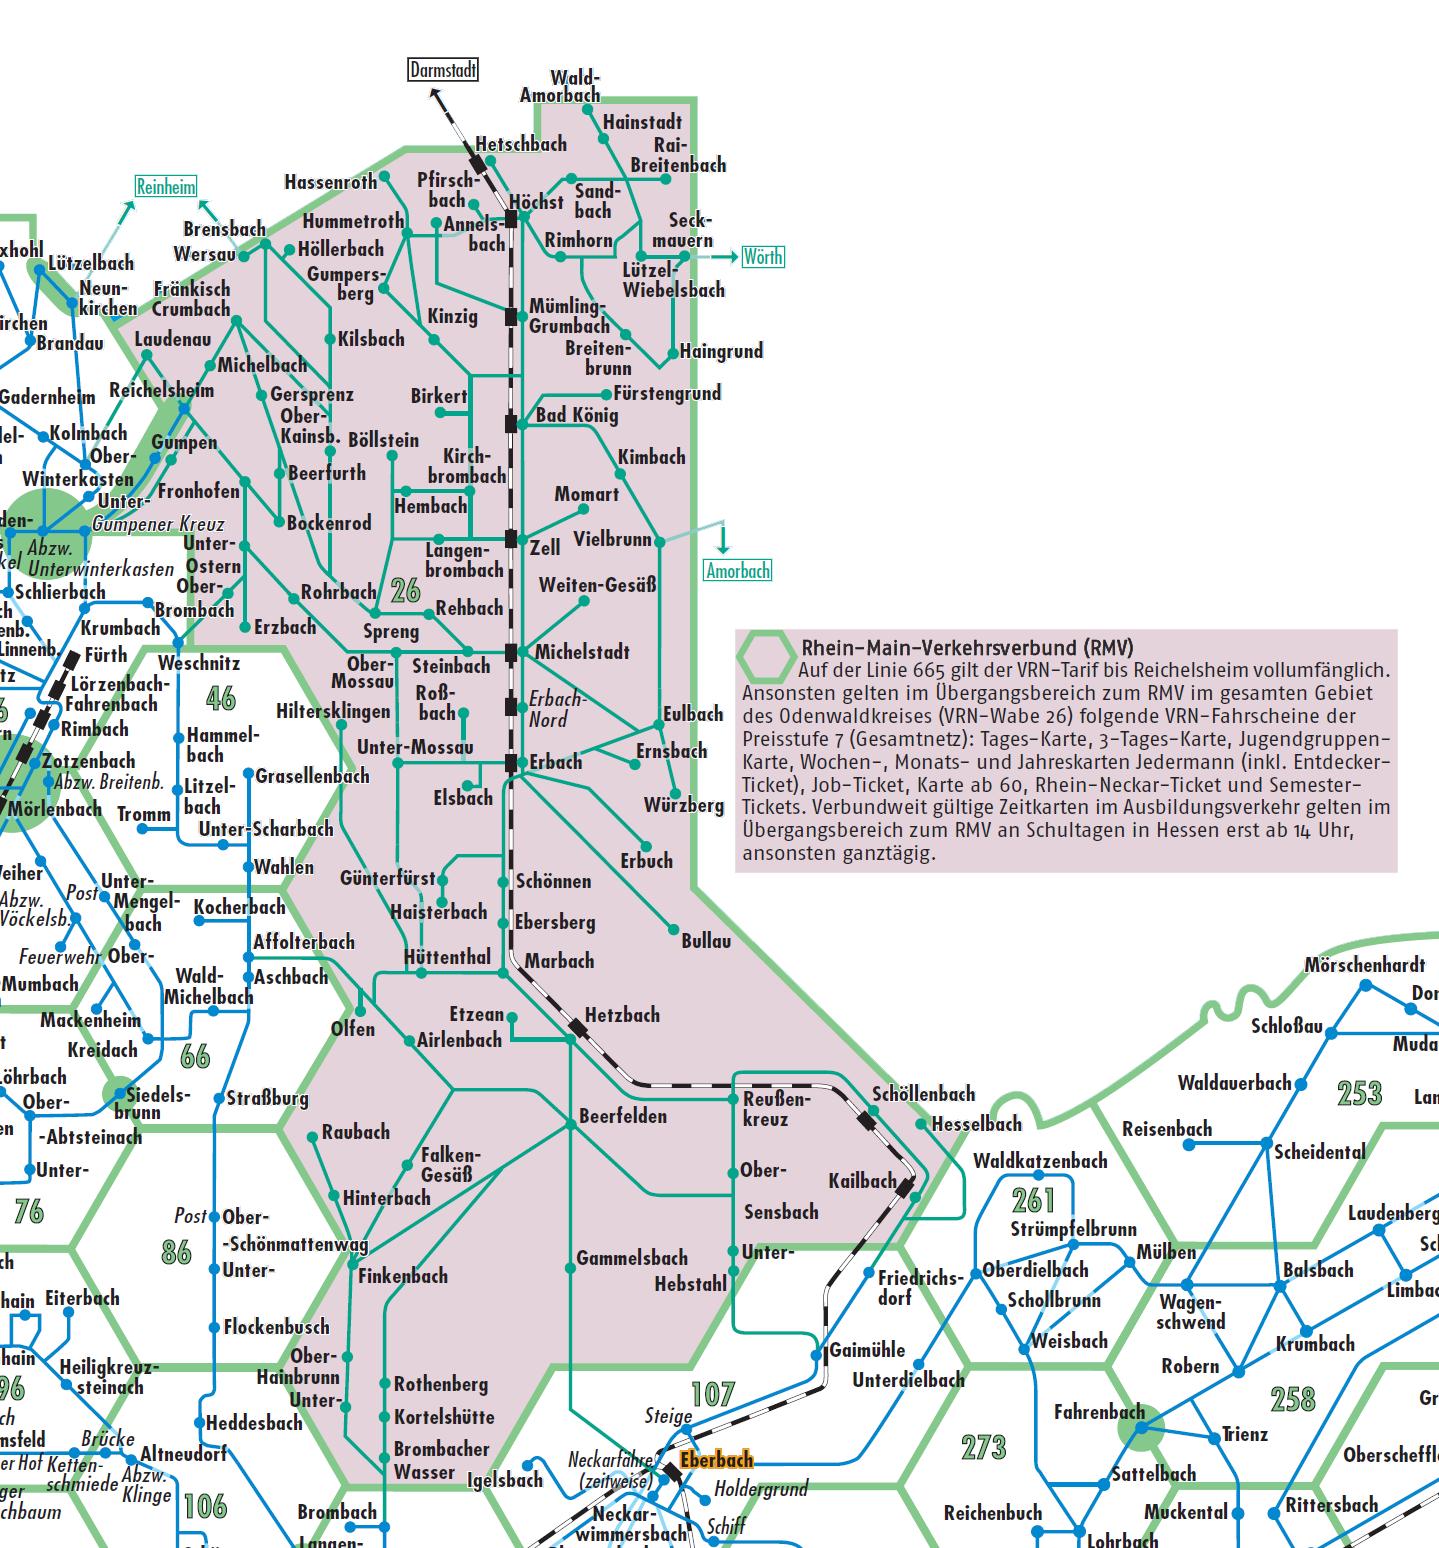 rmv gebiet karte VRN | Übergang zum Rhein Main Verkehrsverbund (RMV)